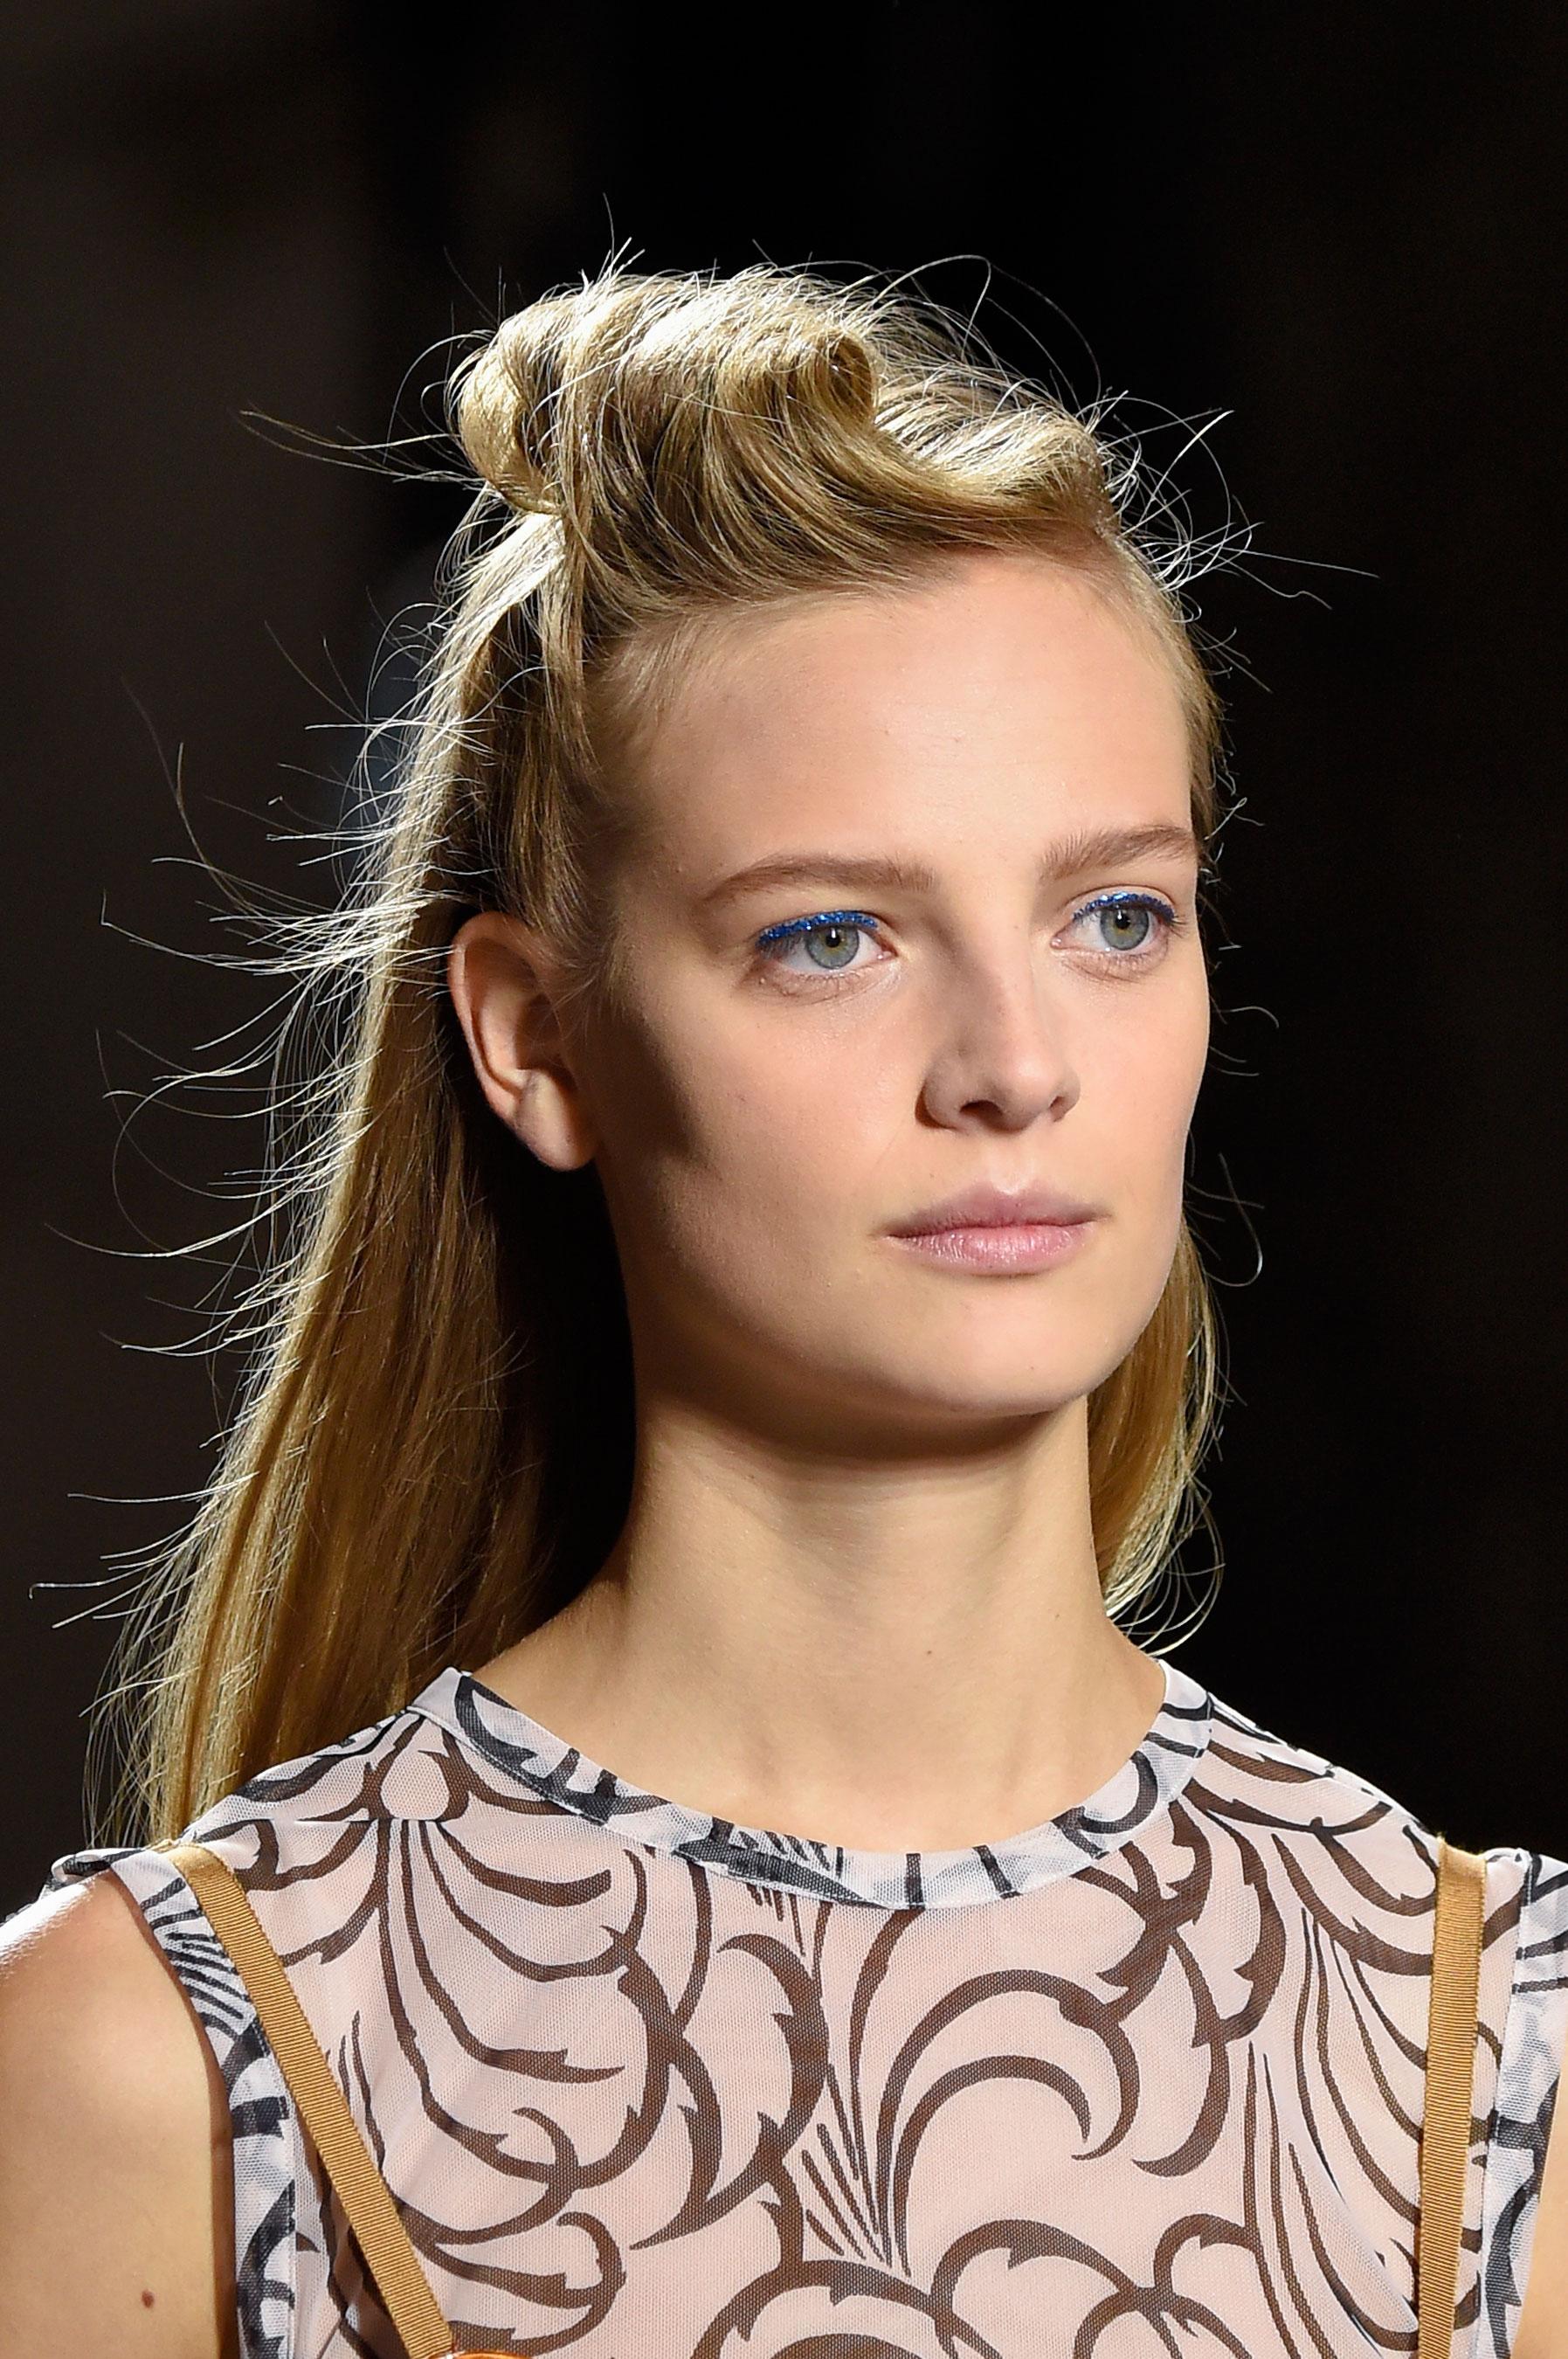 Dries-van-Noten-spring-2016-runway-beauty-fashion-show-the-impression-23